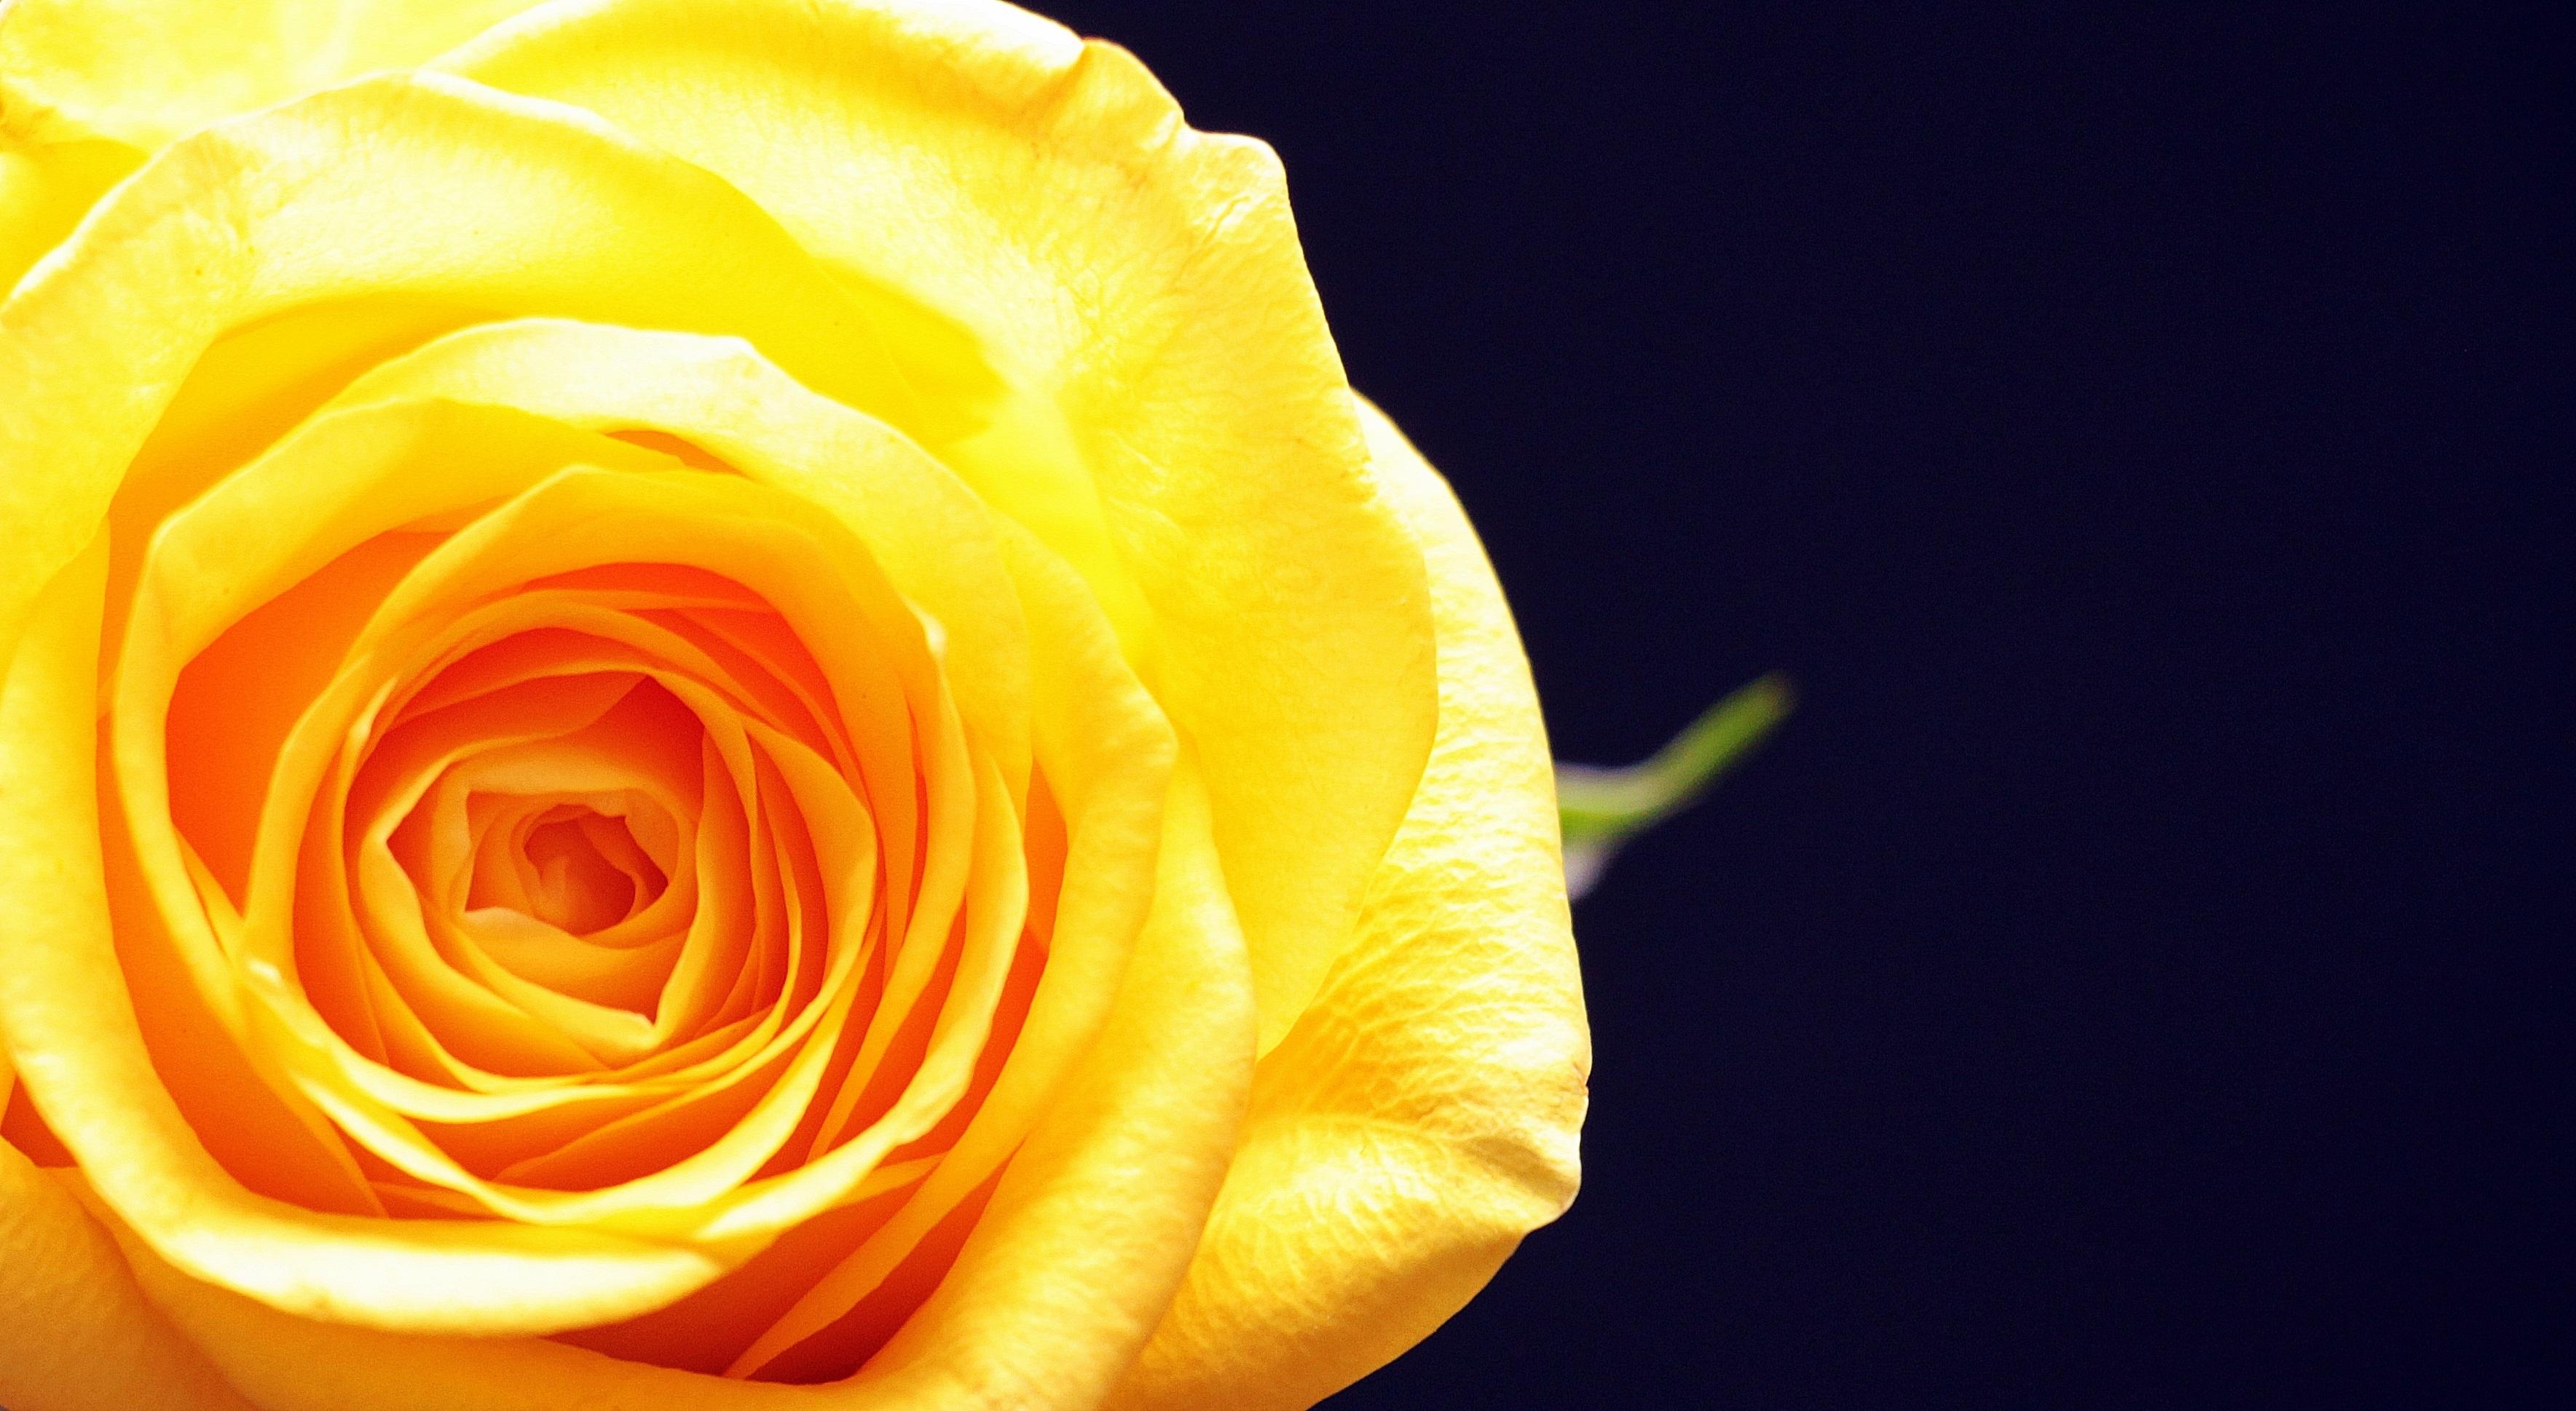 Free Images : blossom, petal, love, black, yellow flower ...